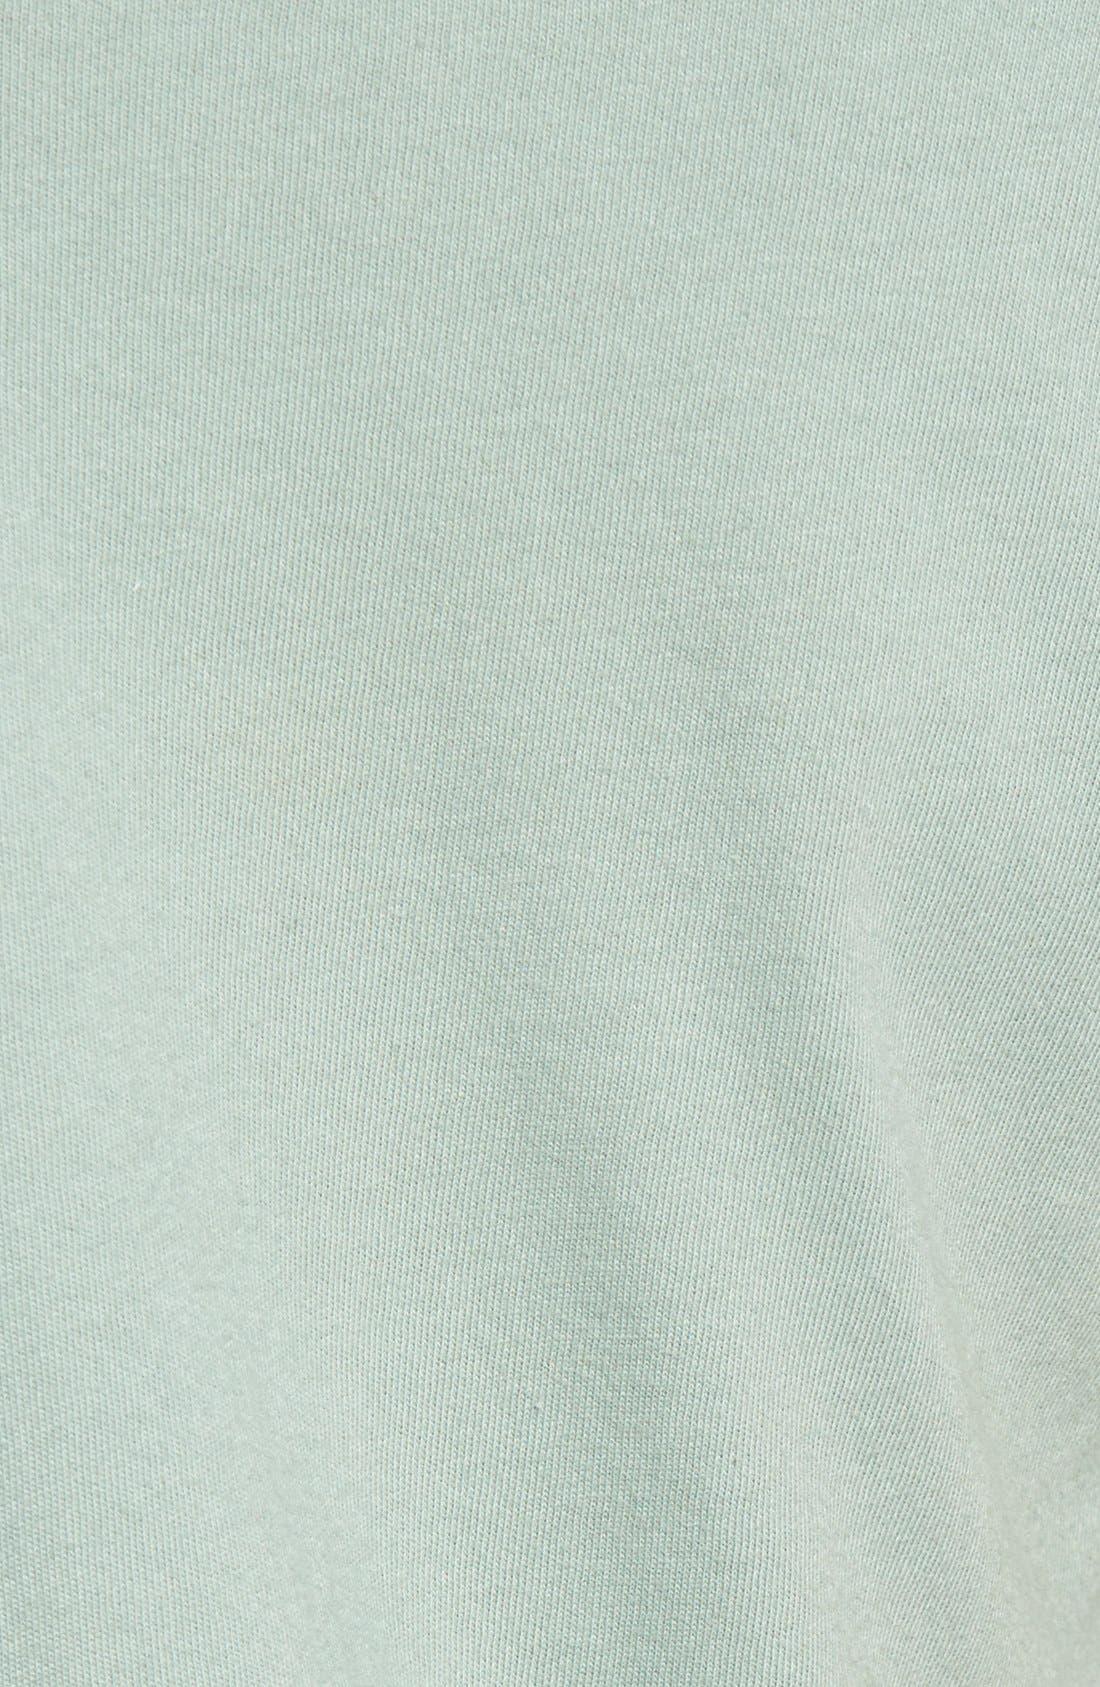 Alternate Image 3  - Project Social T Oversize T-Shirt Tunic